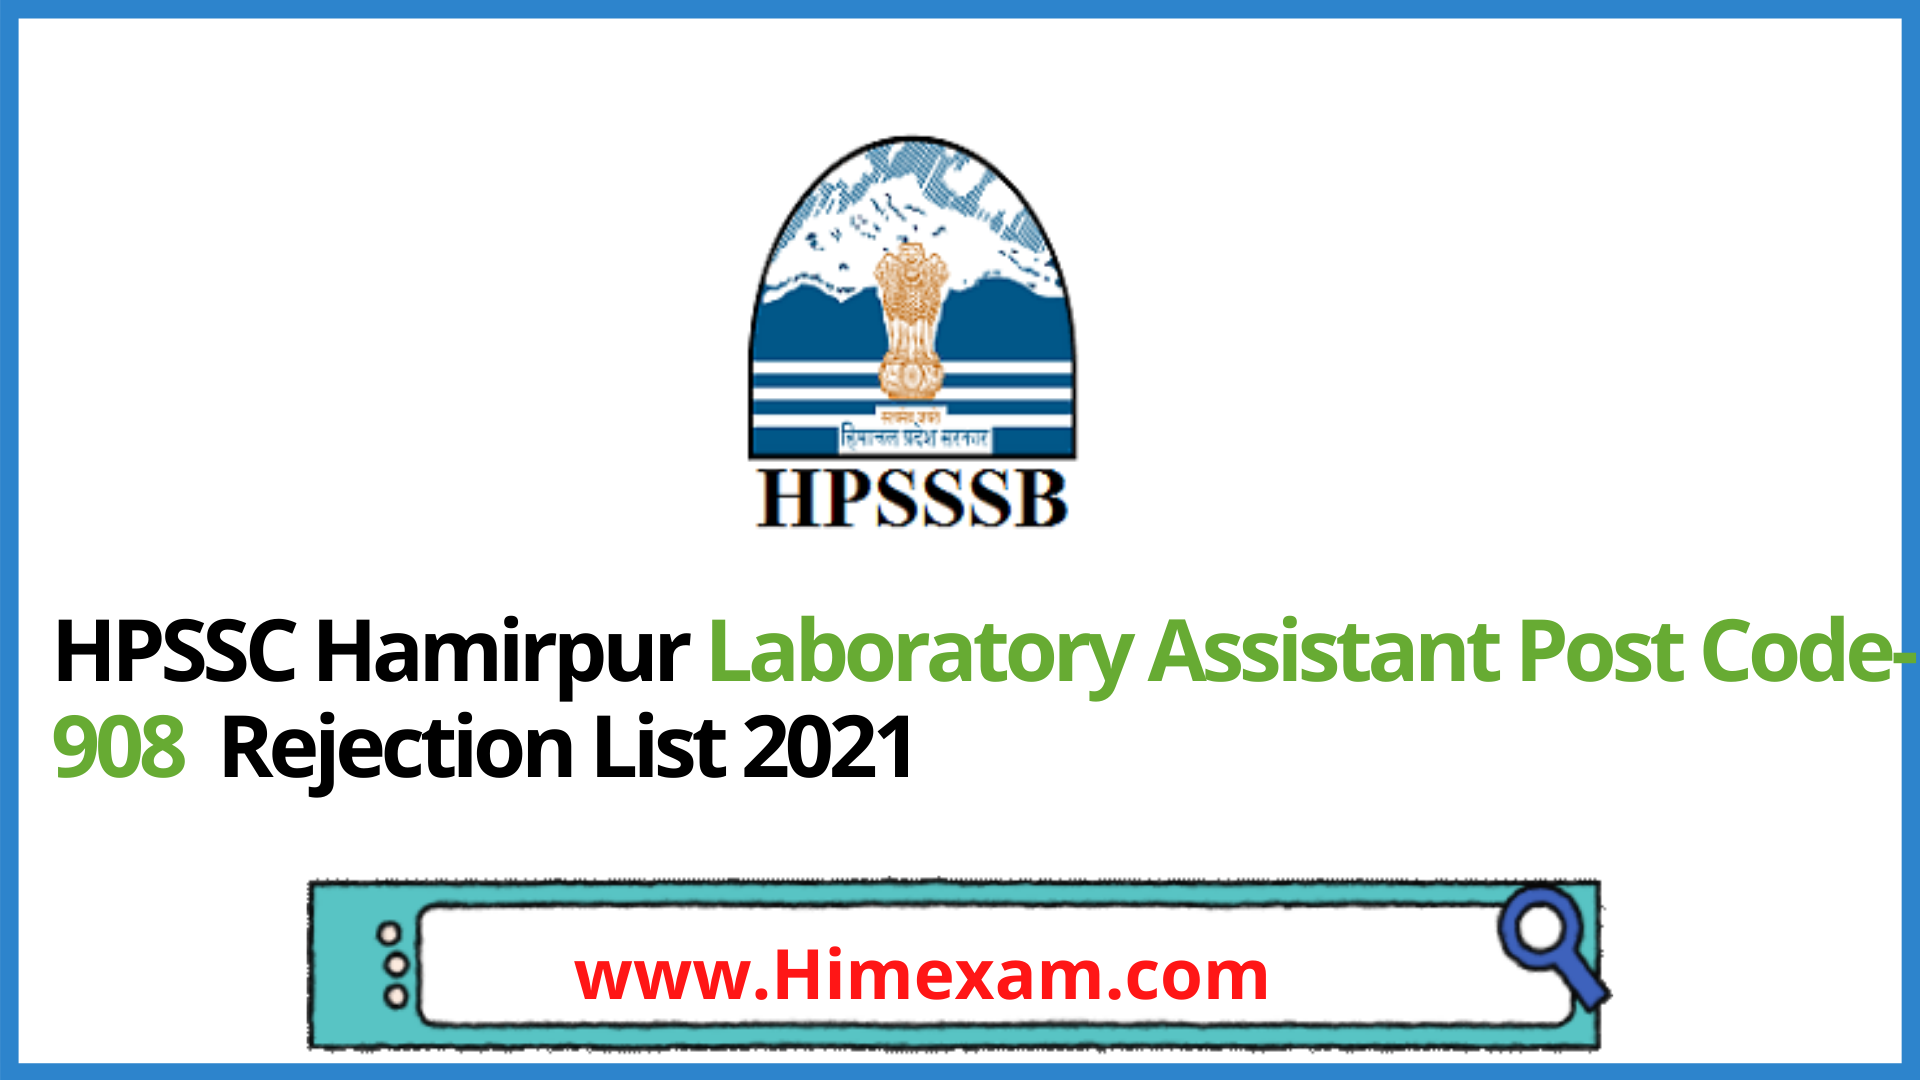 HPSSC Hamirpur Laboratory Assistant Post Code-908  Rejection List 2021